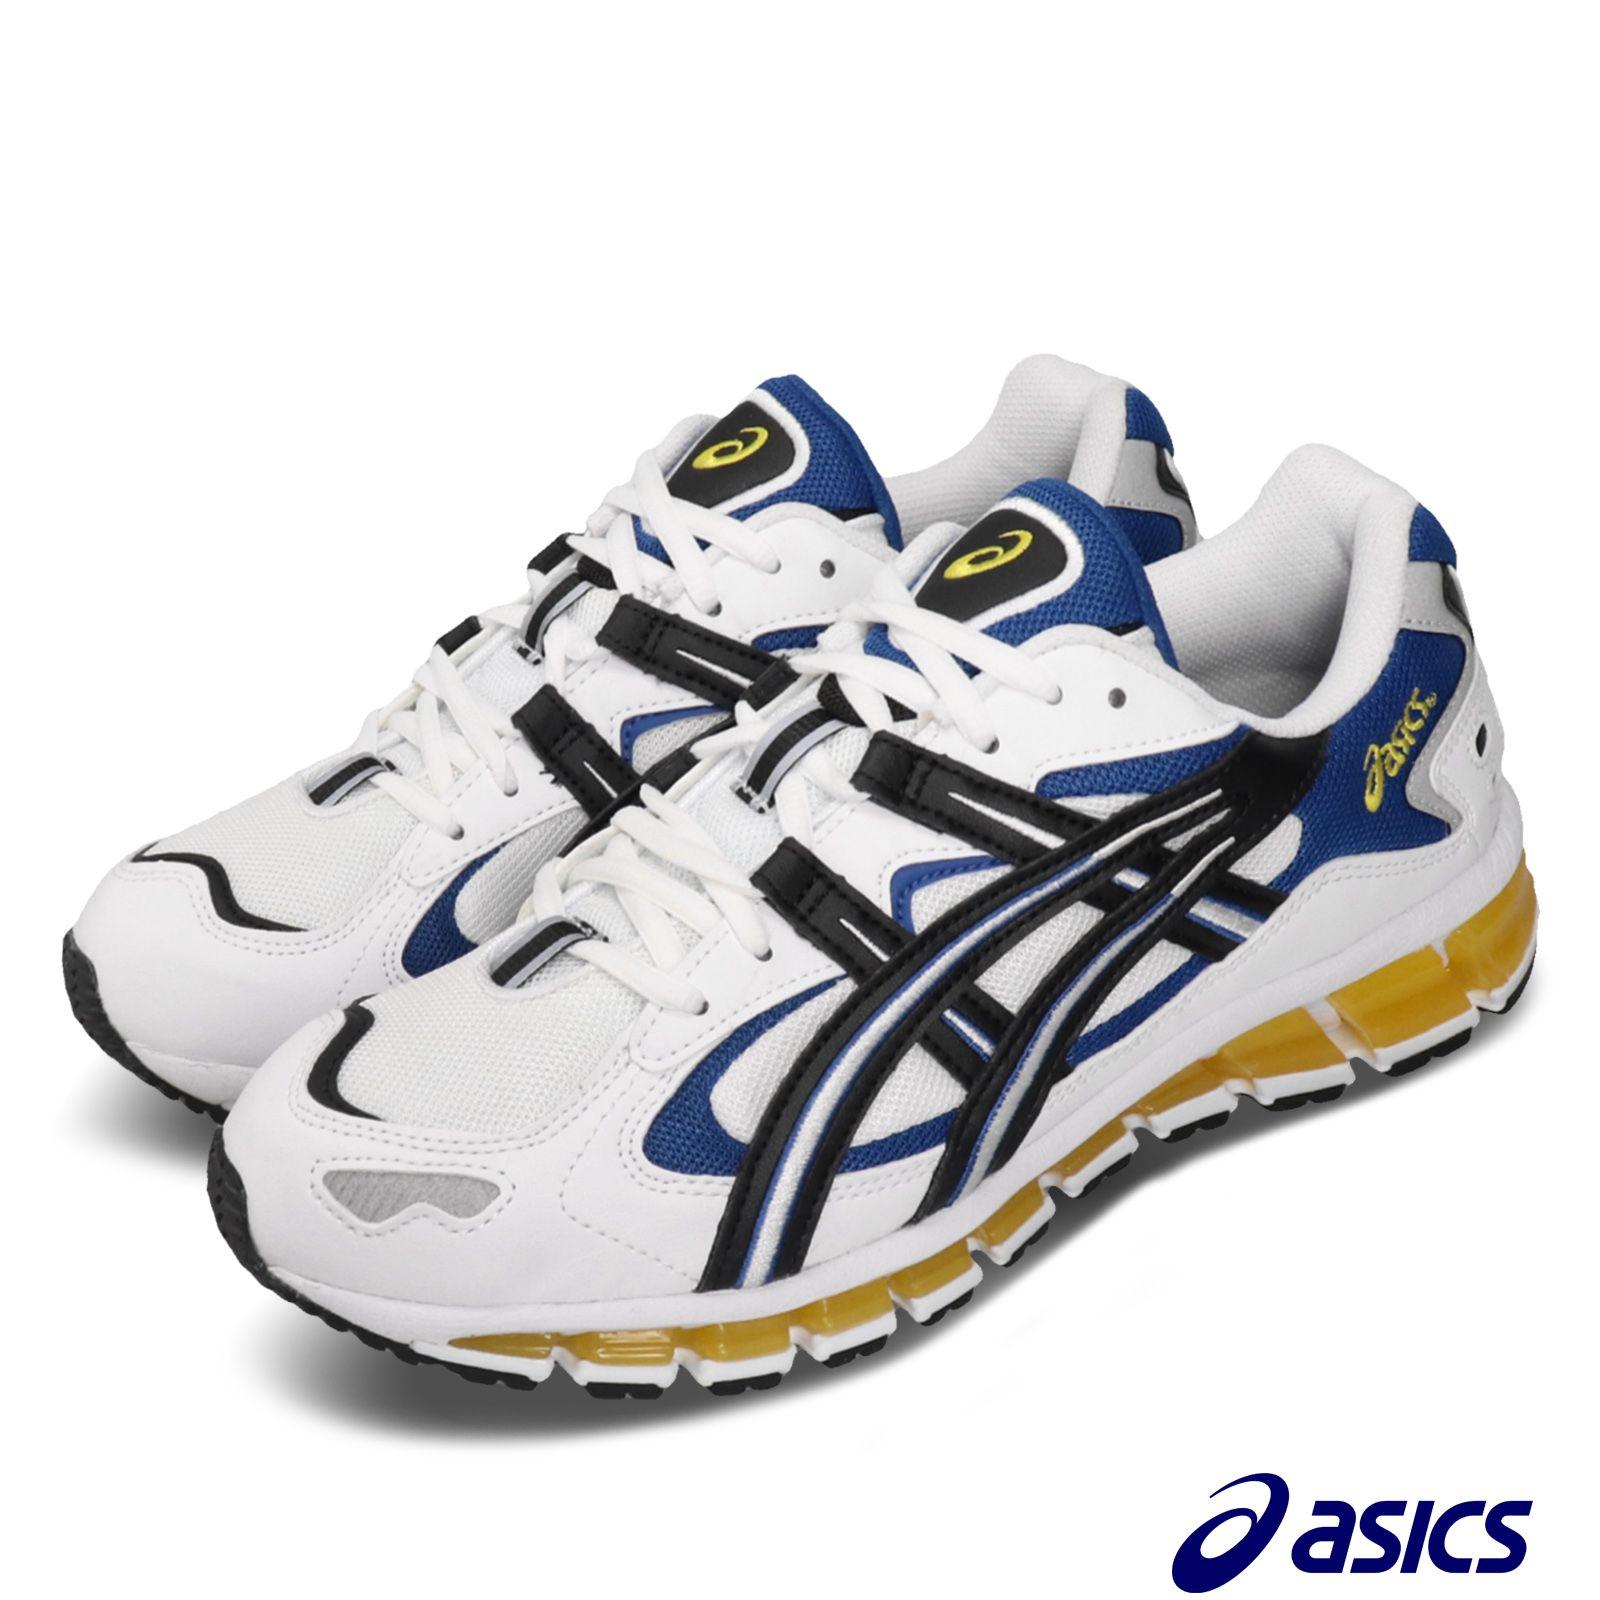 Asics 慢跑鞋 Gel-Kayano 5 360 男鞋 1021A159100